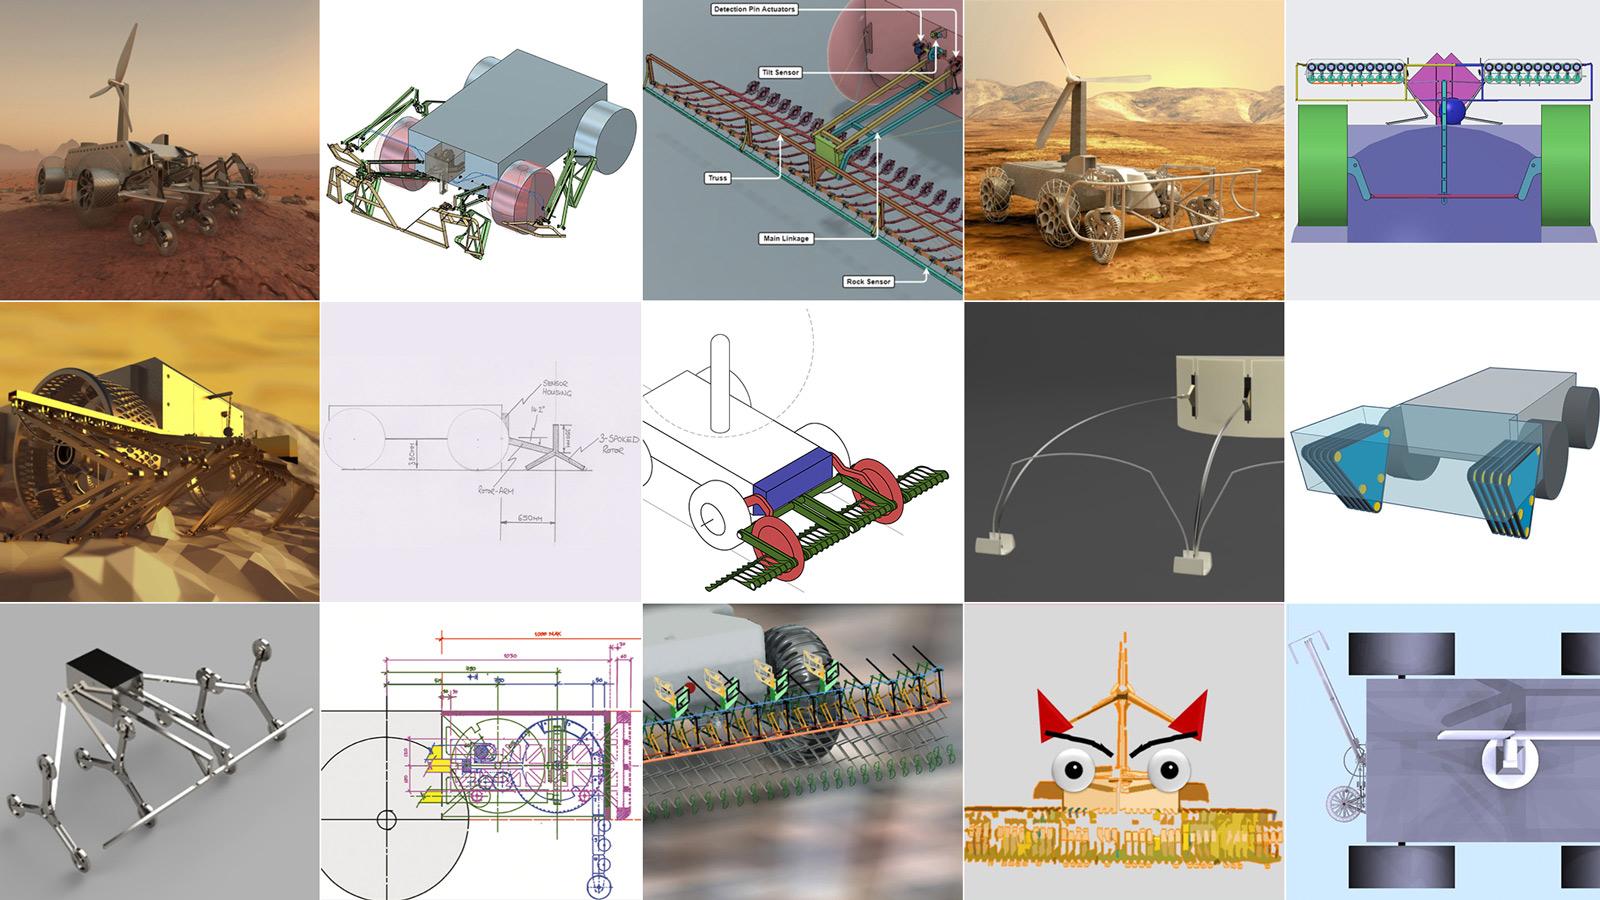 https://www.nasa.gov/sites/default/files/thumbnails/image/1_collage-all-finalists-order-16.jpg